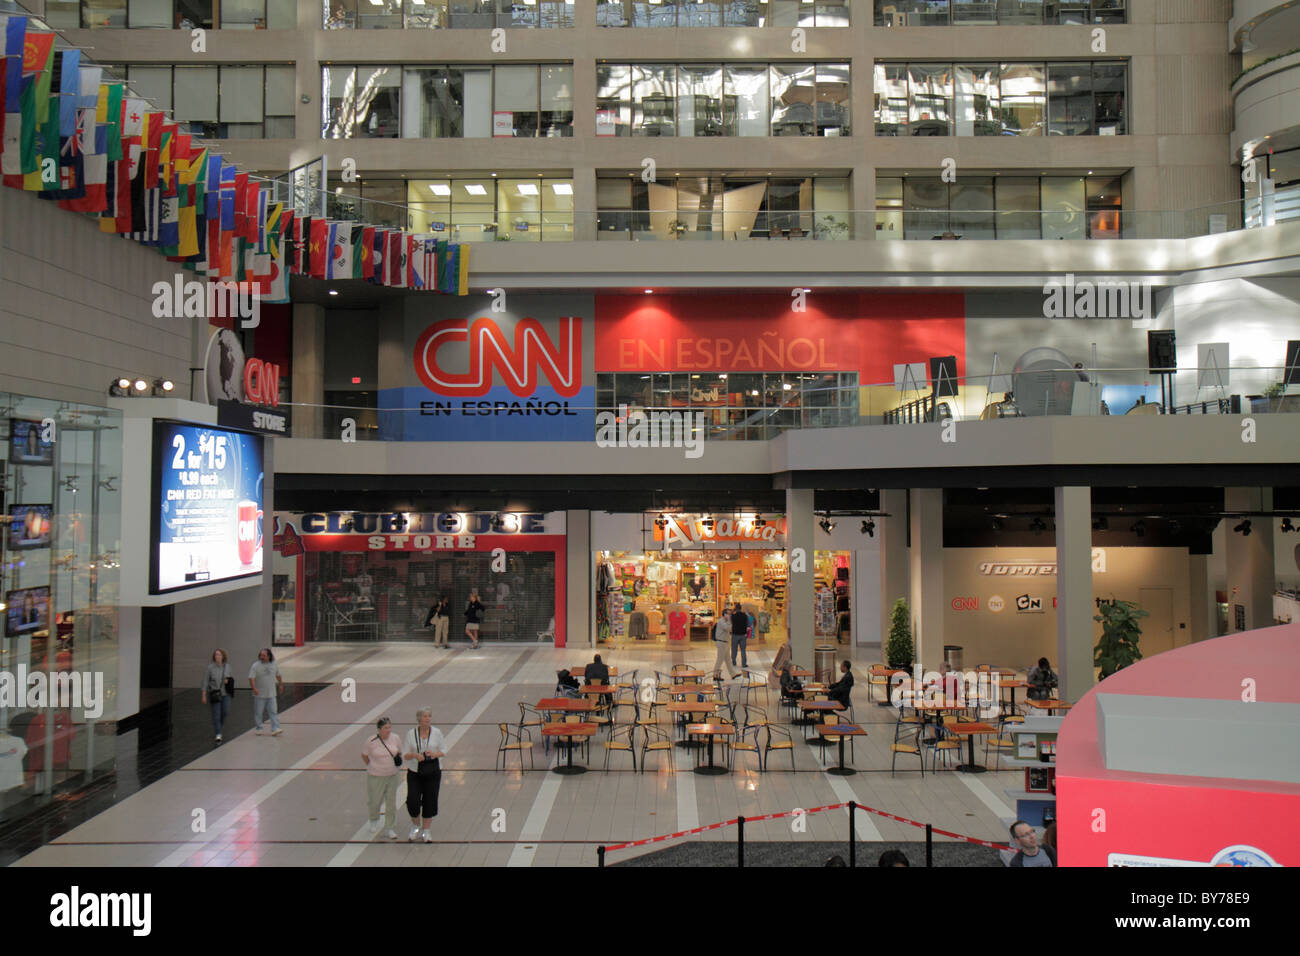 Atlanta géorgie cnn center atrium store shopping en espanol cnn